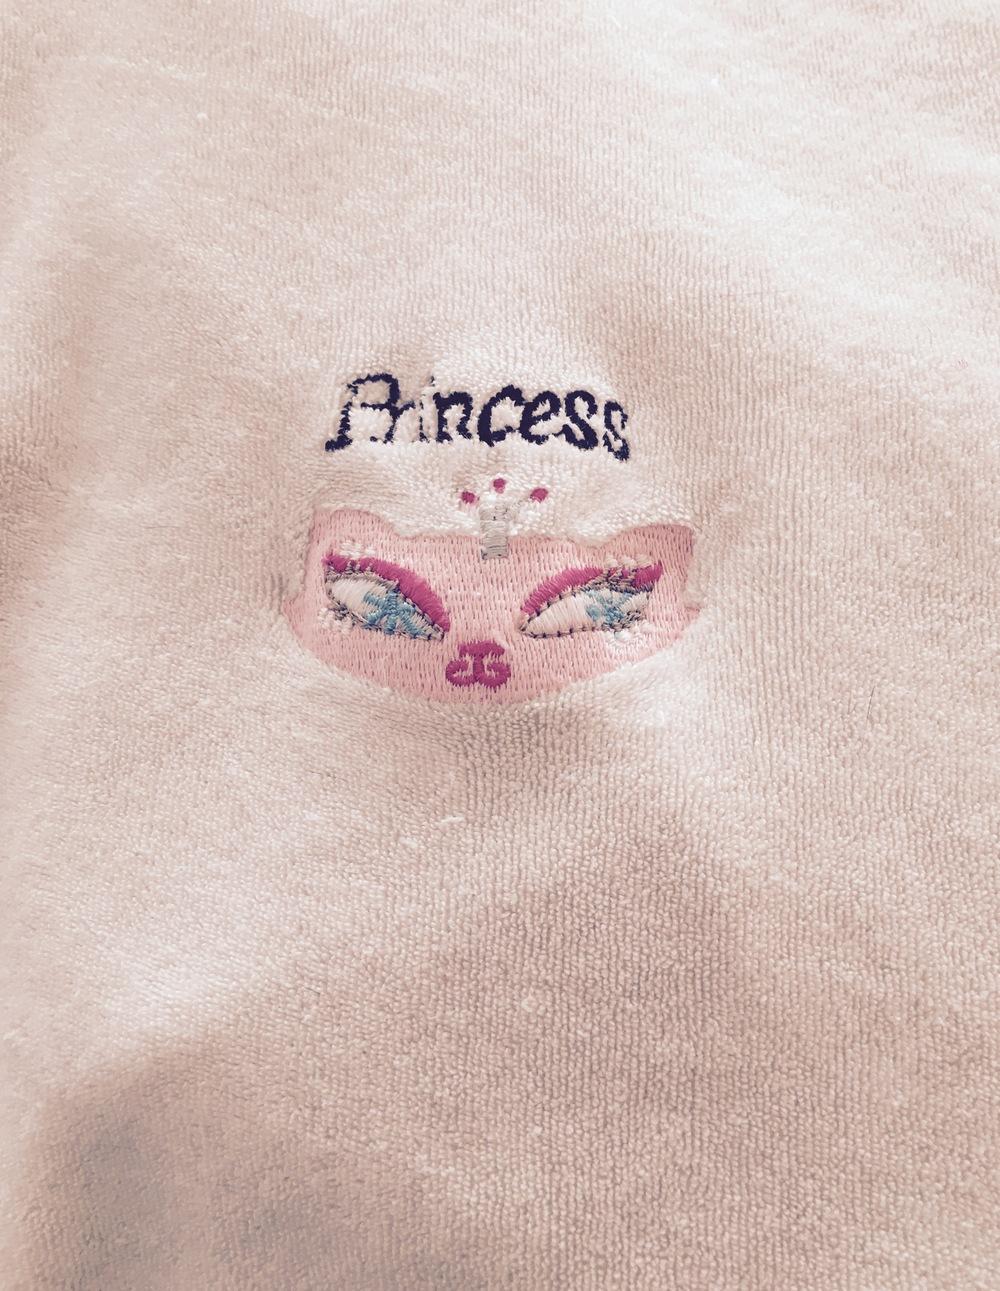 Princess Carolyn totally existed before Bojack Horseman! #toteslegit